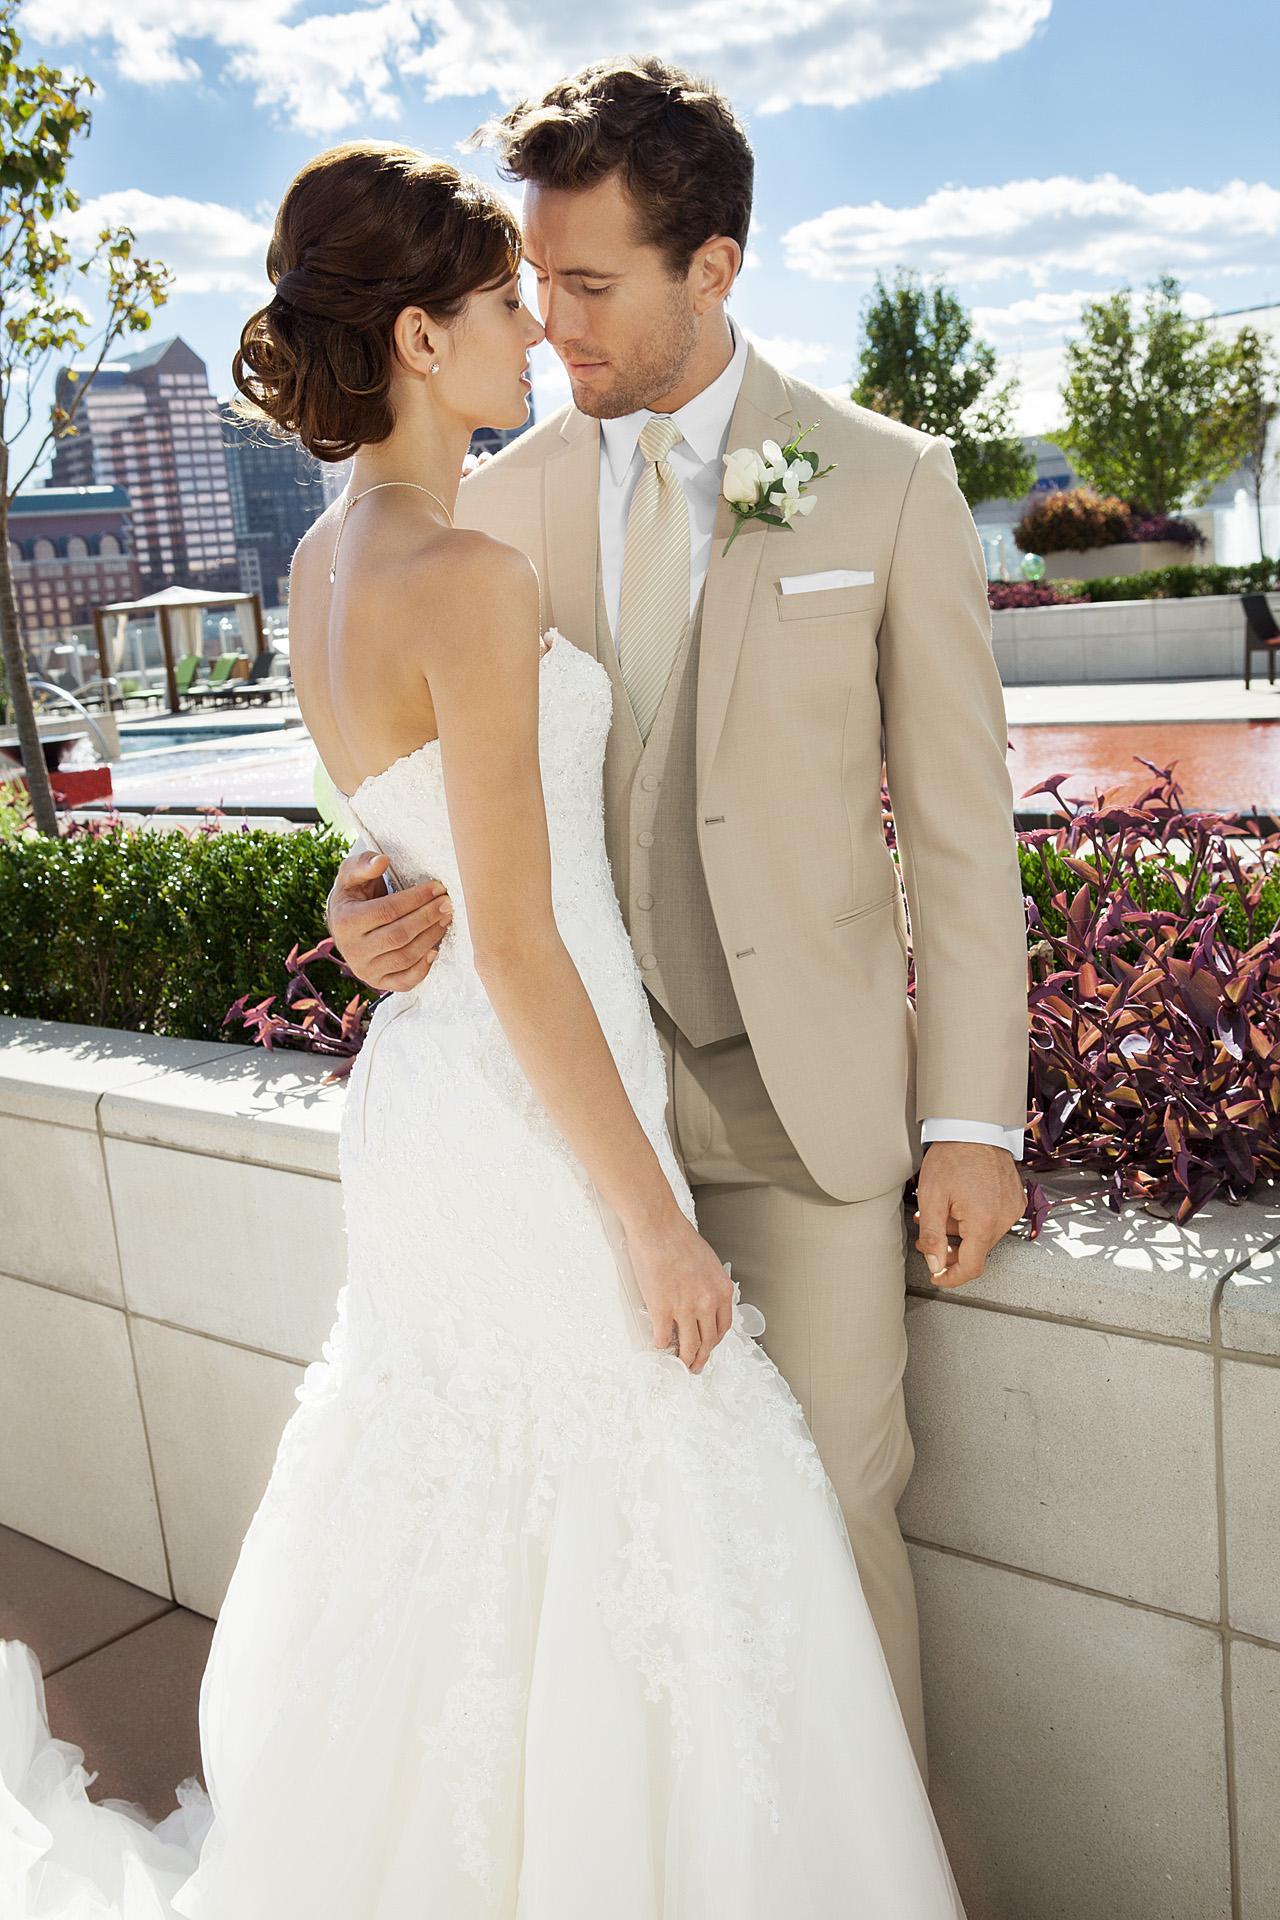 wedding-suit-tan-havana-252-4.jpg